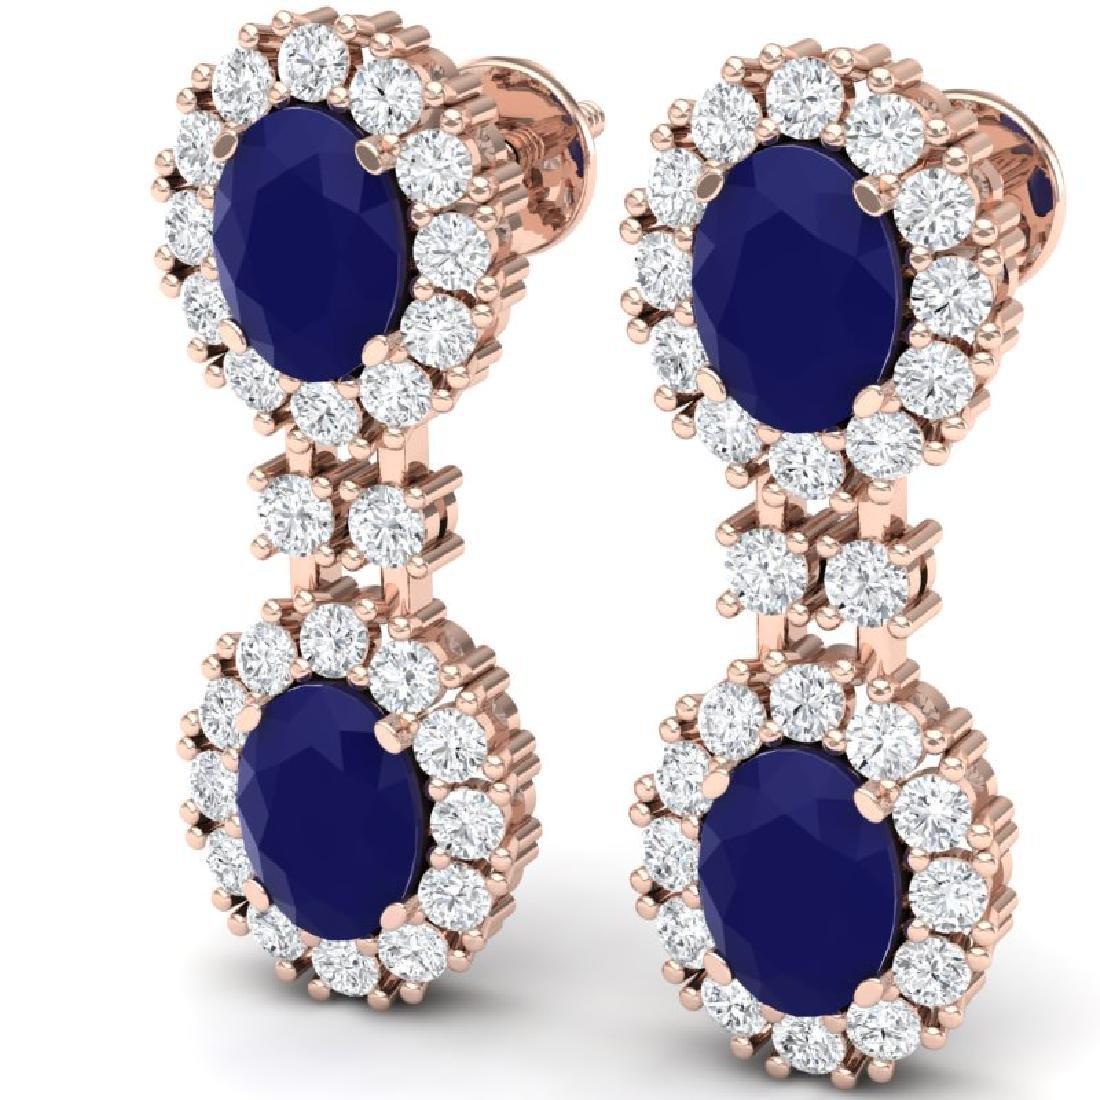 8.98 CTW Royalty Sapphire & VS Diamond Earrings 18K - 2